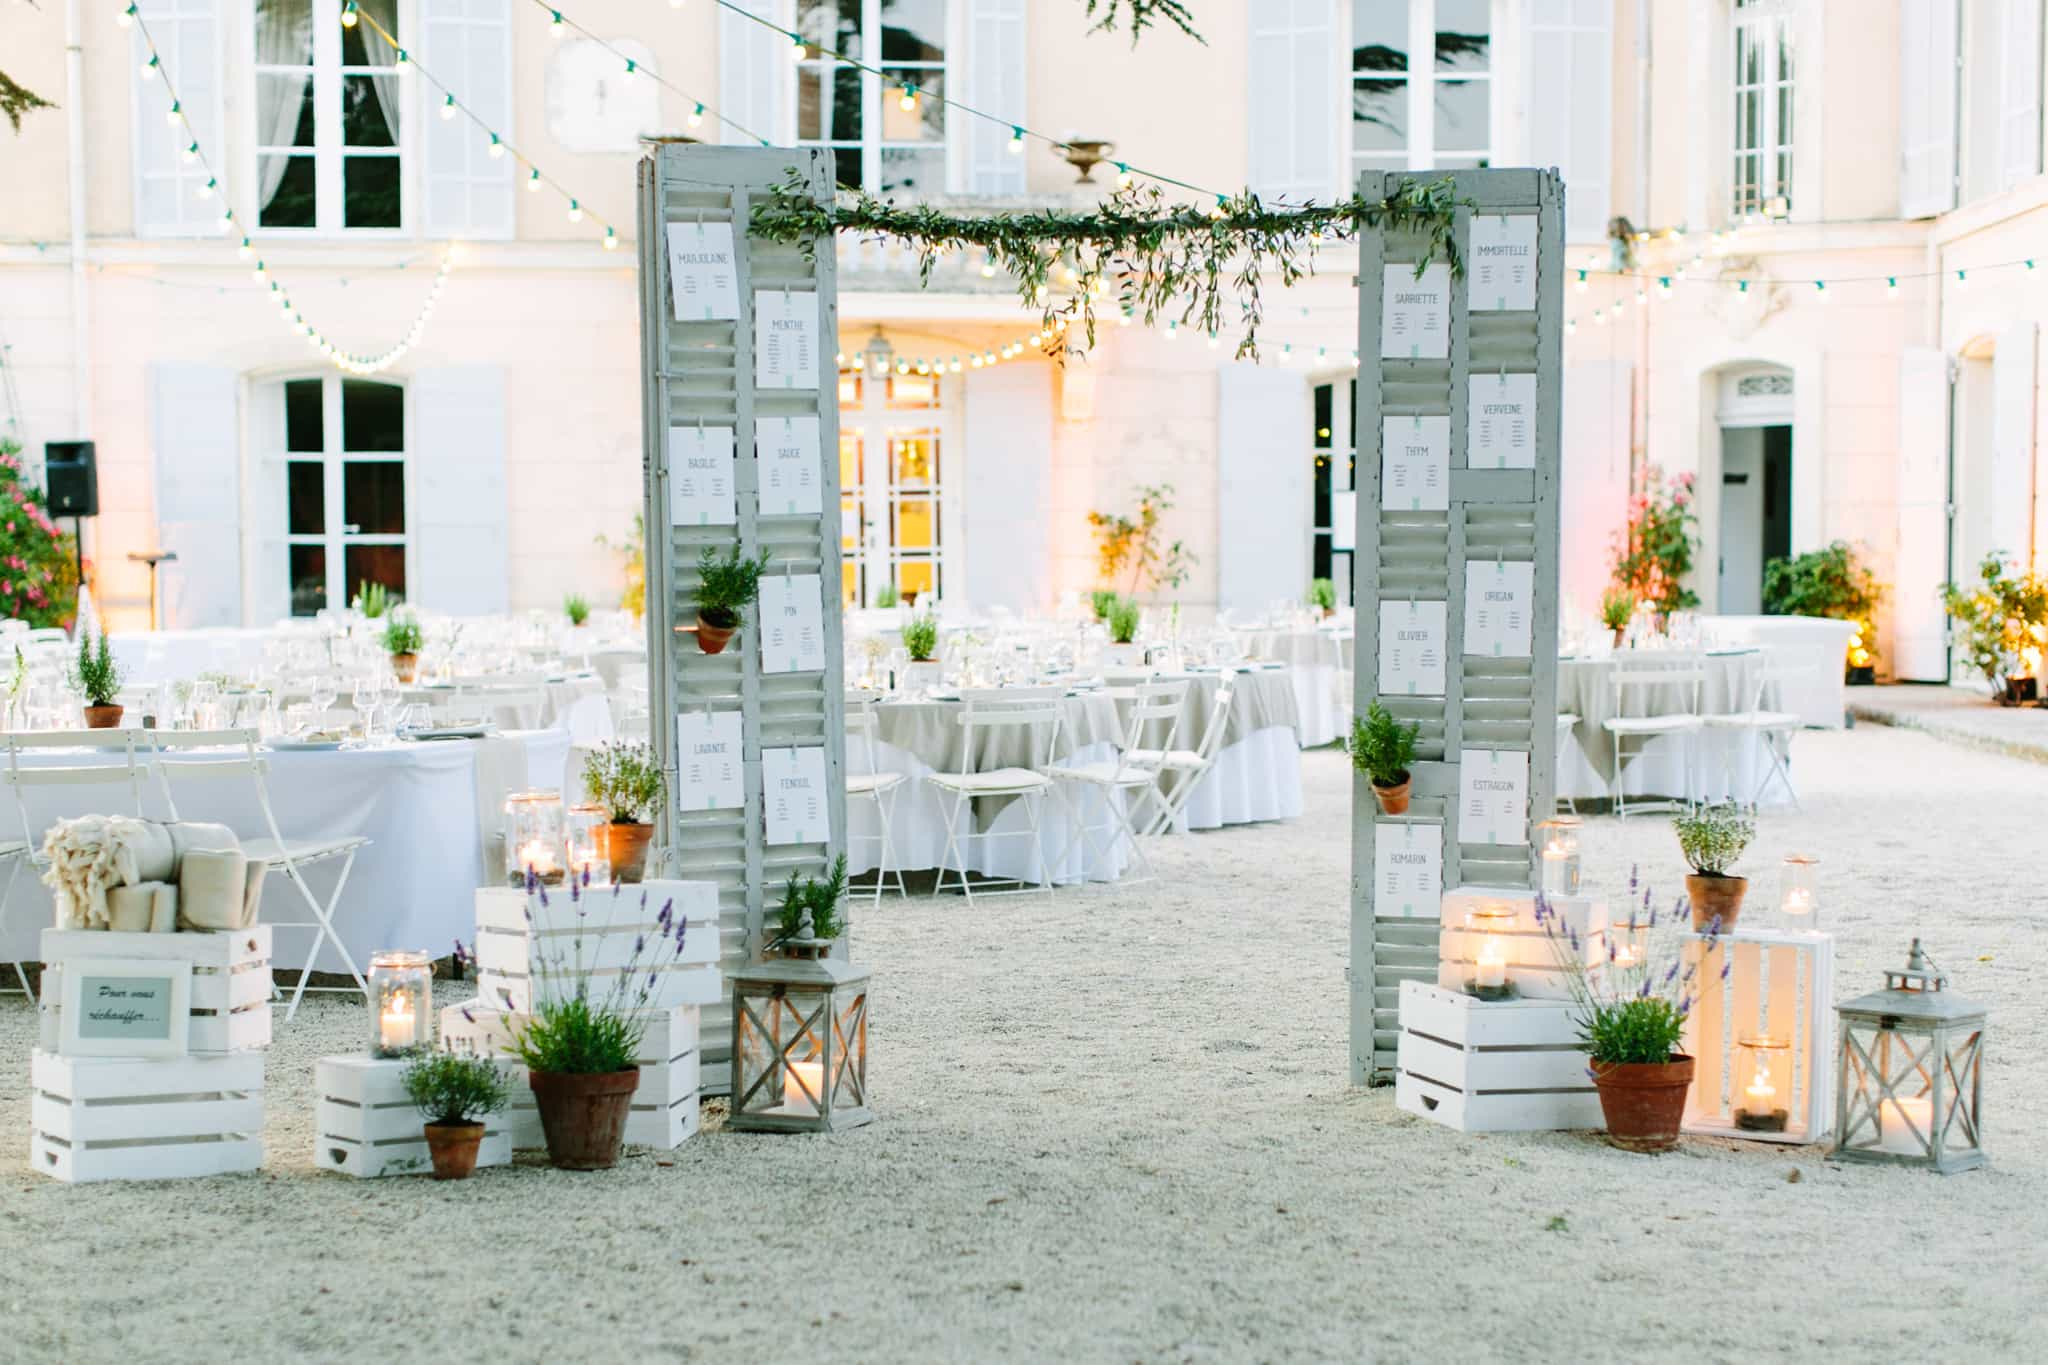 Cigales et Petits Fours - Mariages Provence